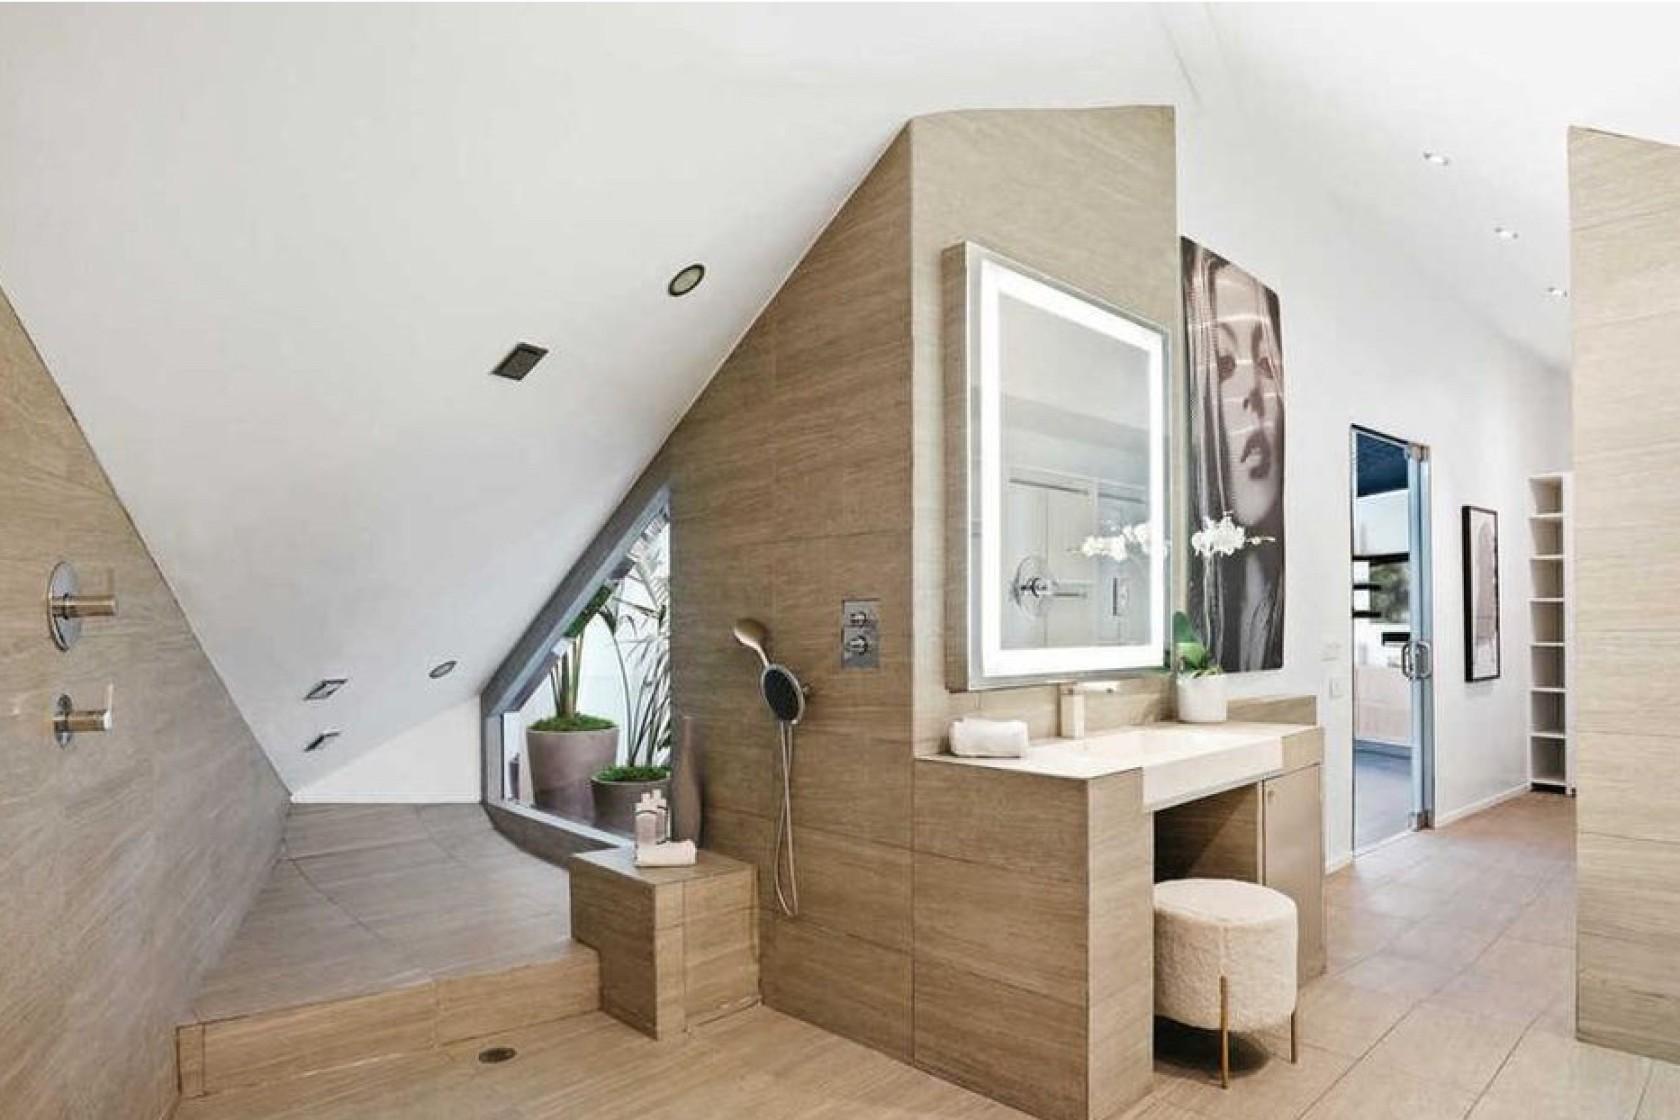 Hasley Jual Rumah Bergaya Modern di Los Angeles